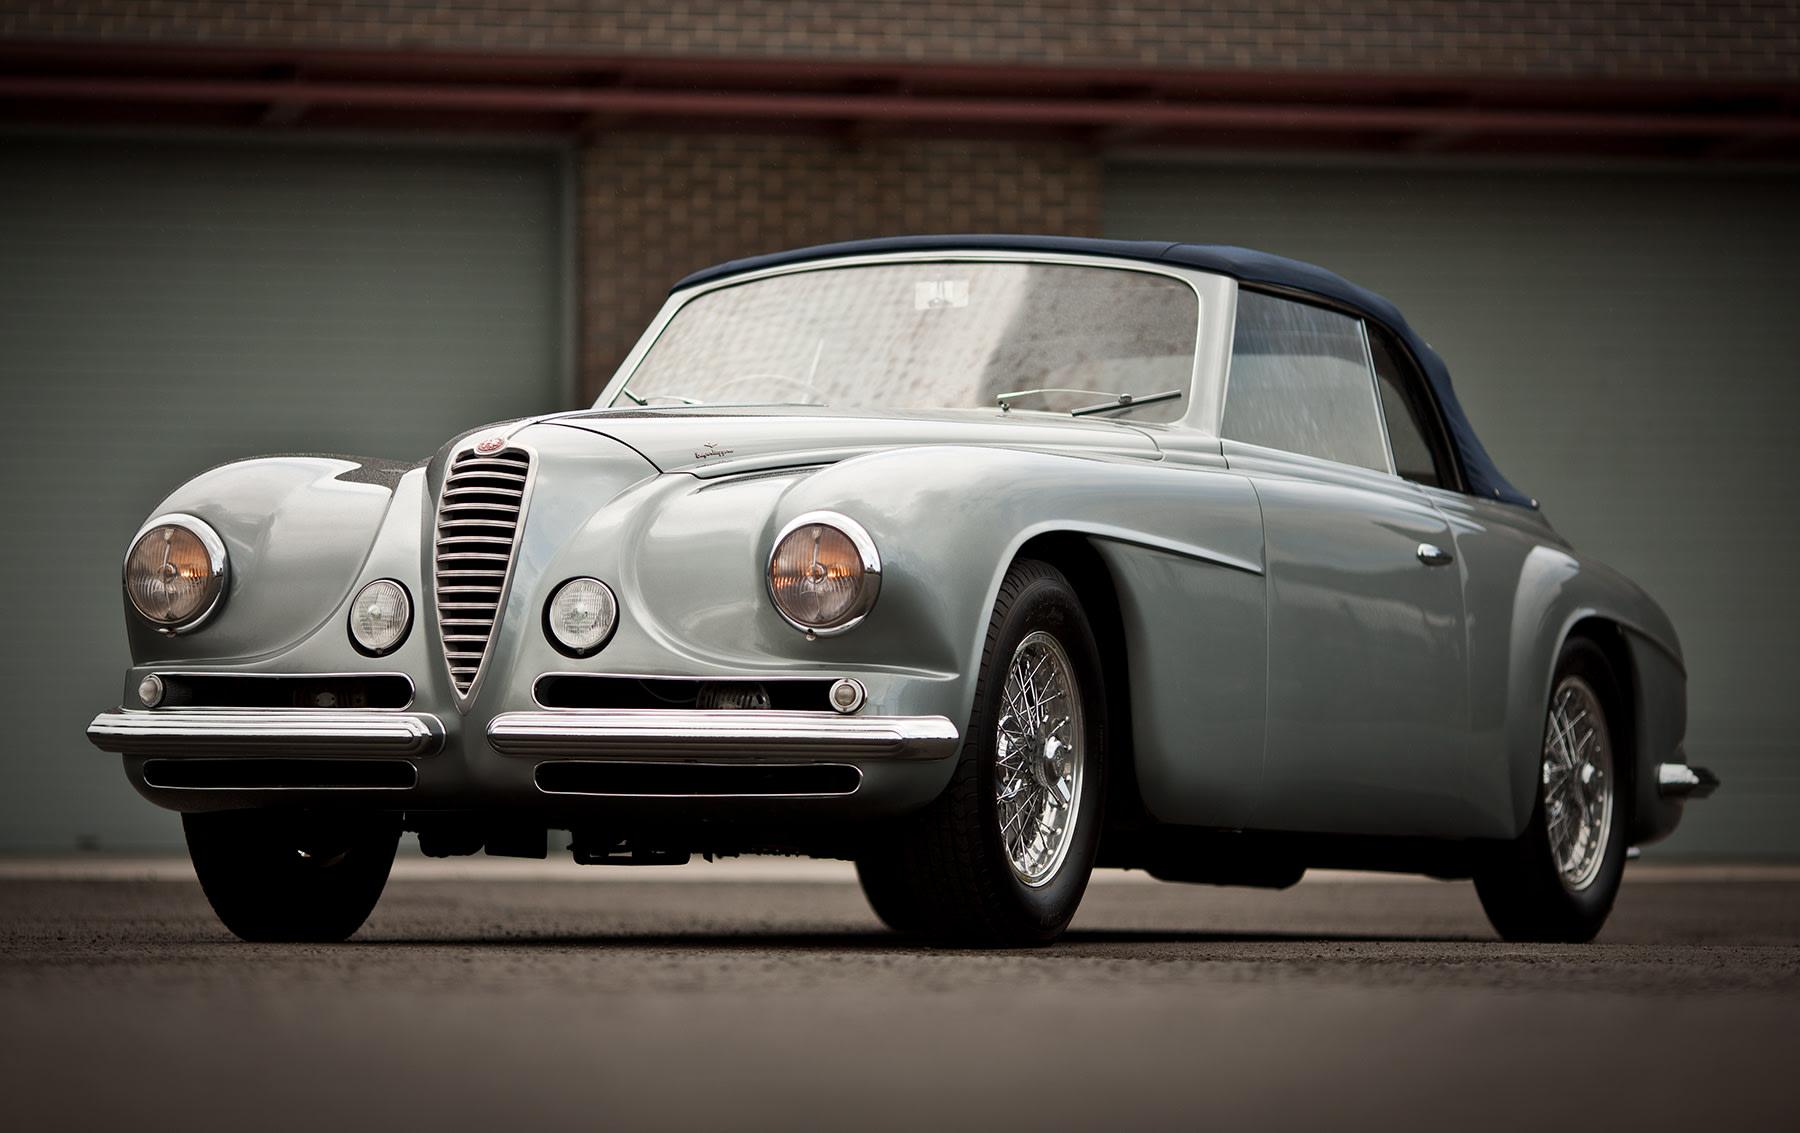 1952 Alfa Romeo 6C 2500 Villa d'Este Cabriolet